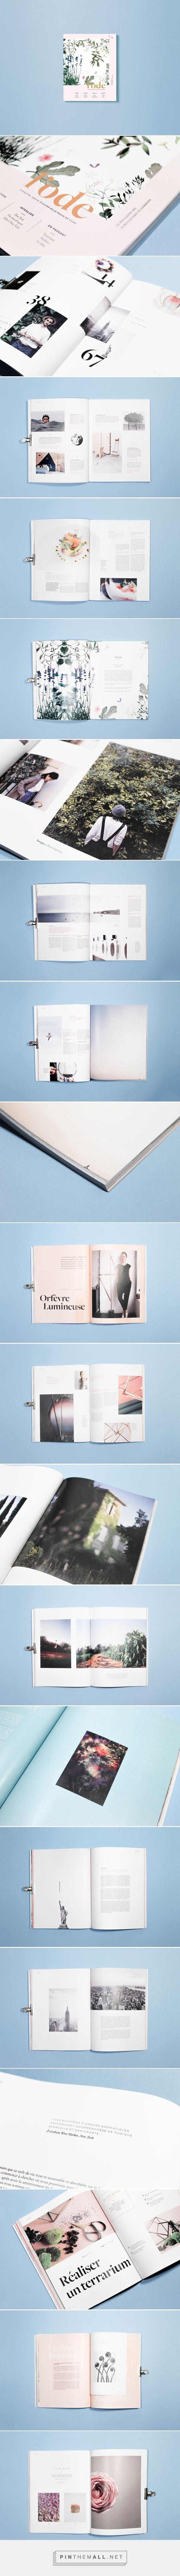 Julie Ferrieux - Behance - l'ode magazine diptyque